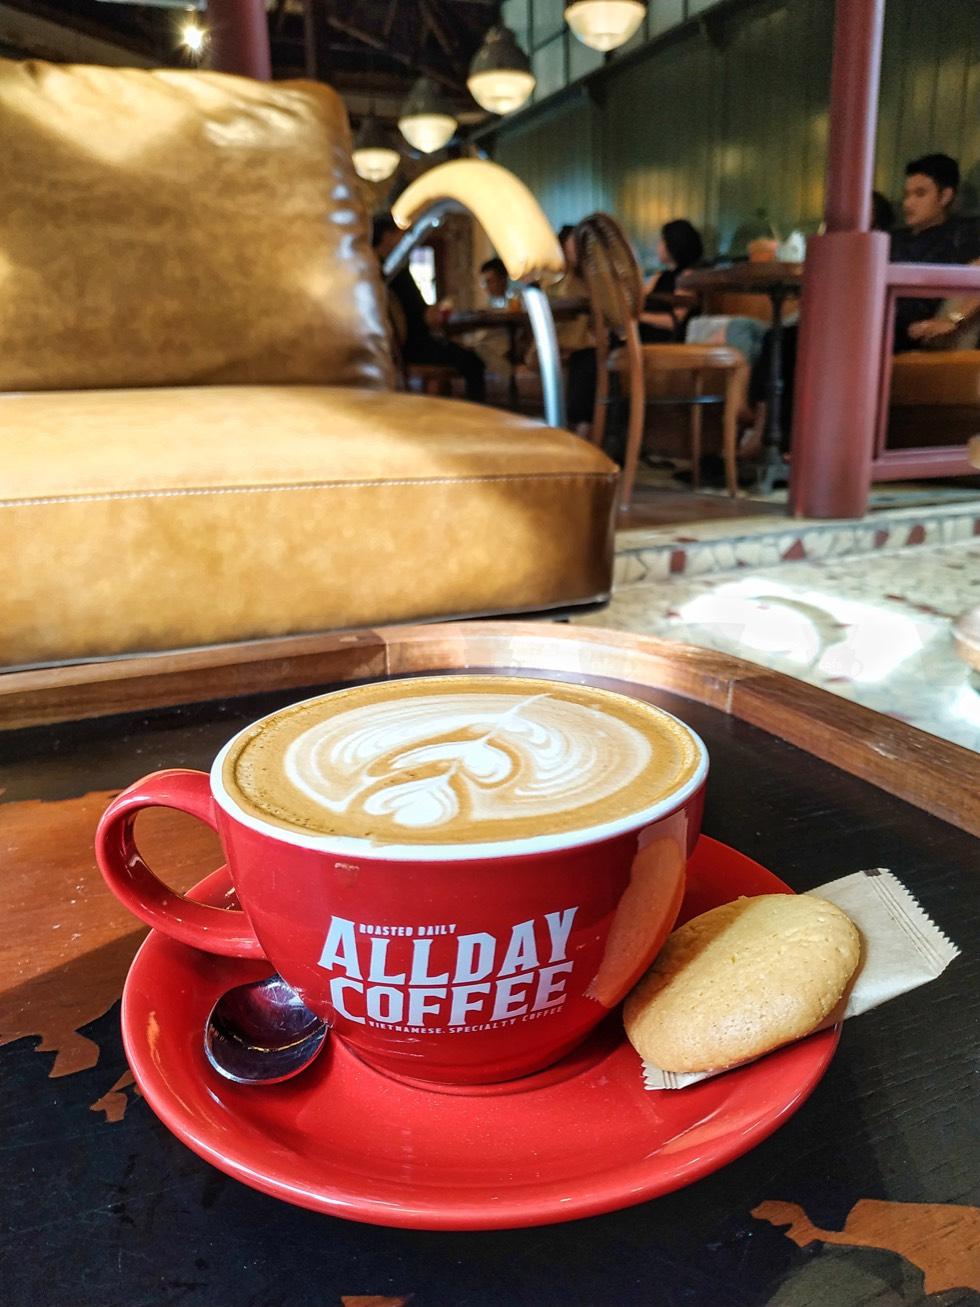 All Day Coffee Closeup